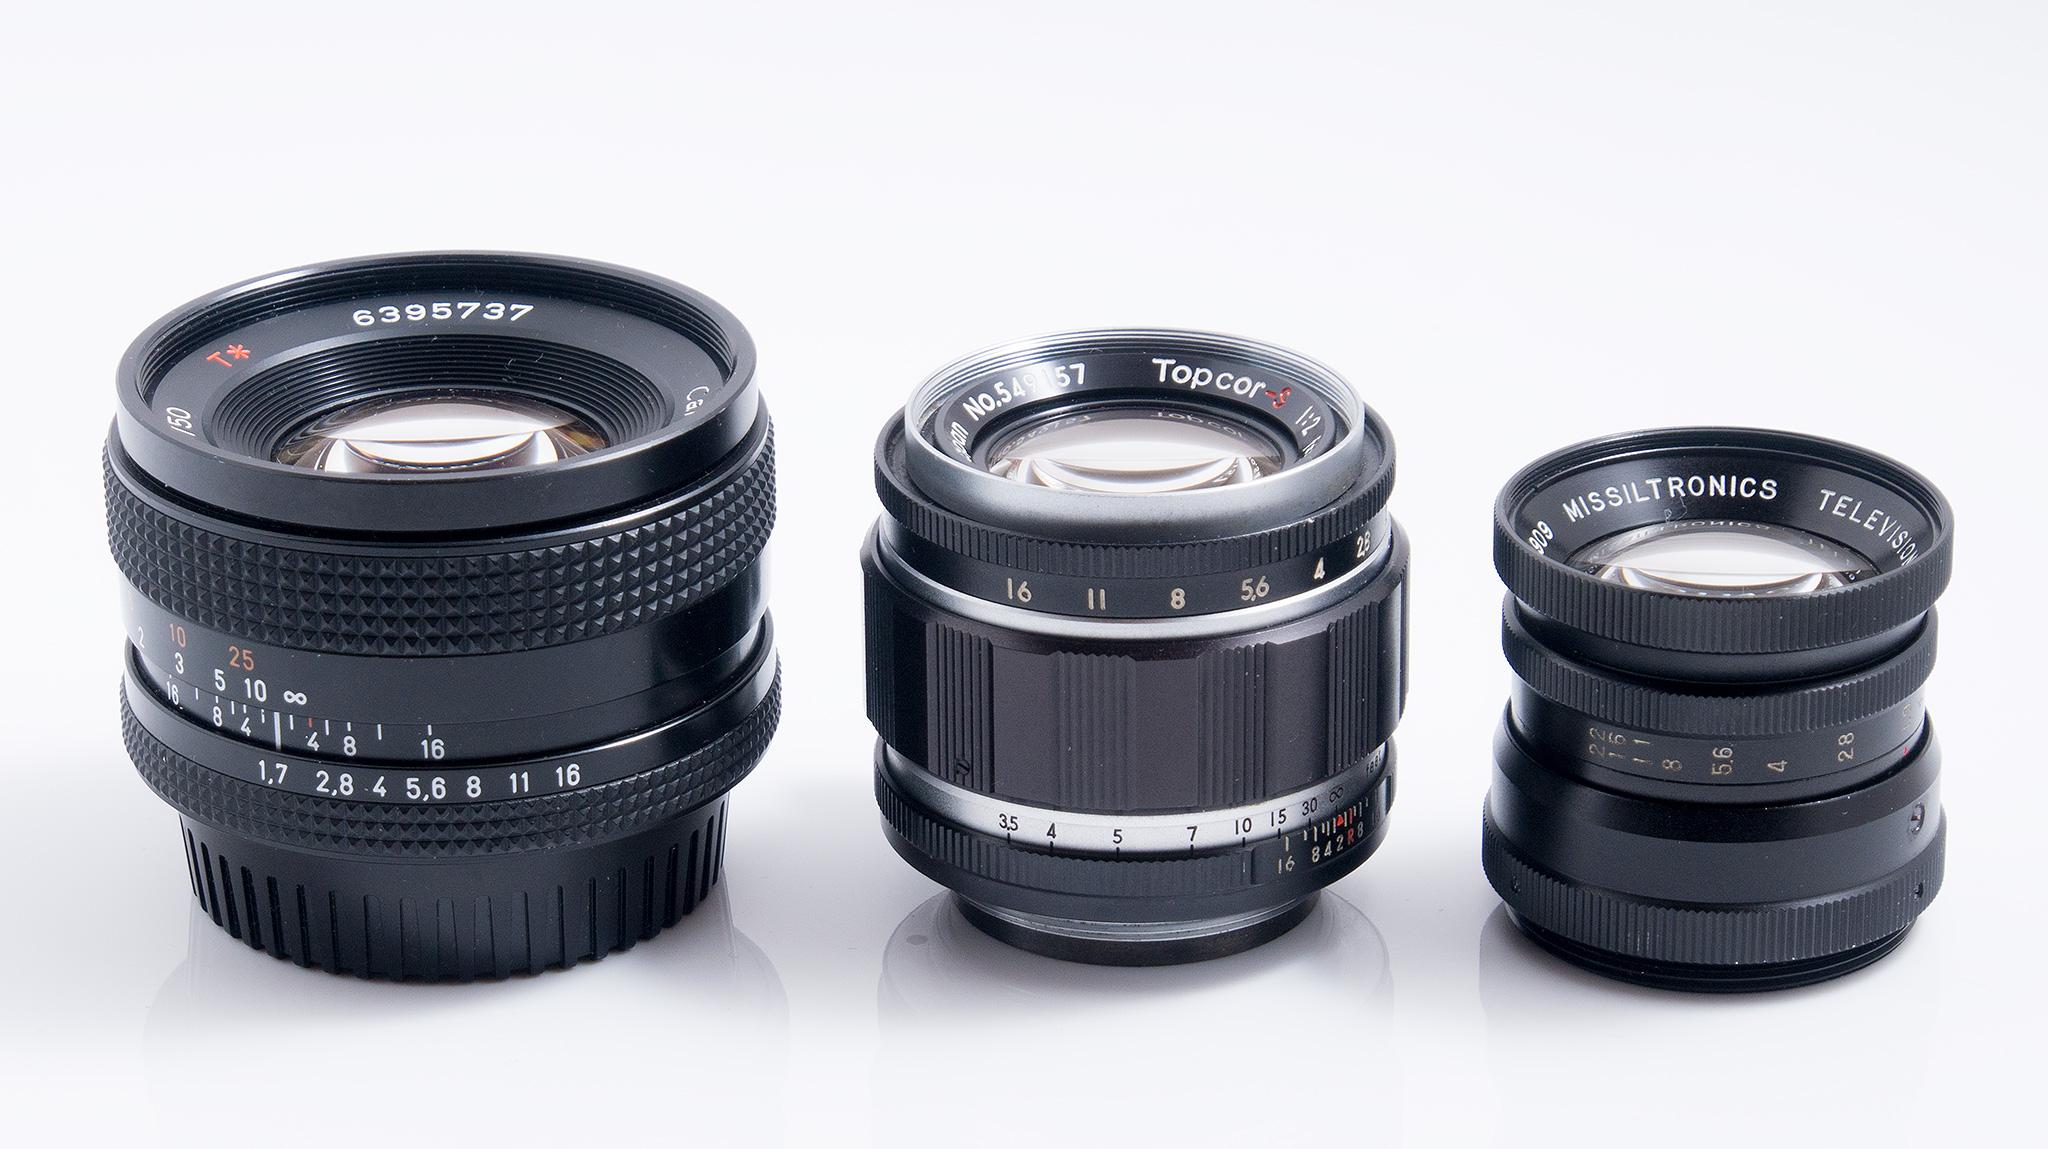 Missiltronics48mm01test2